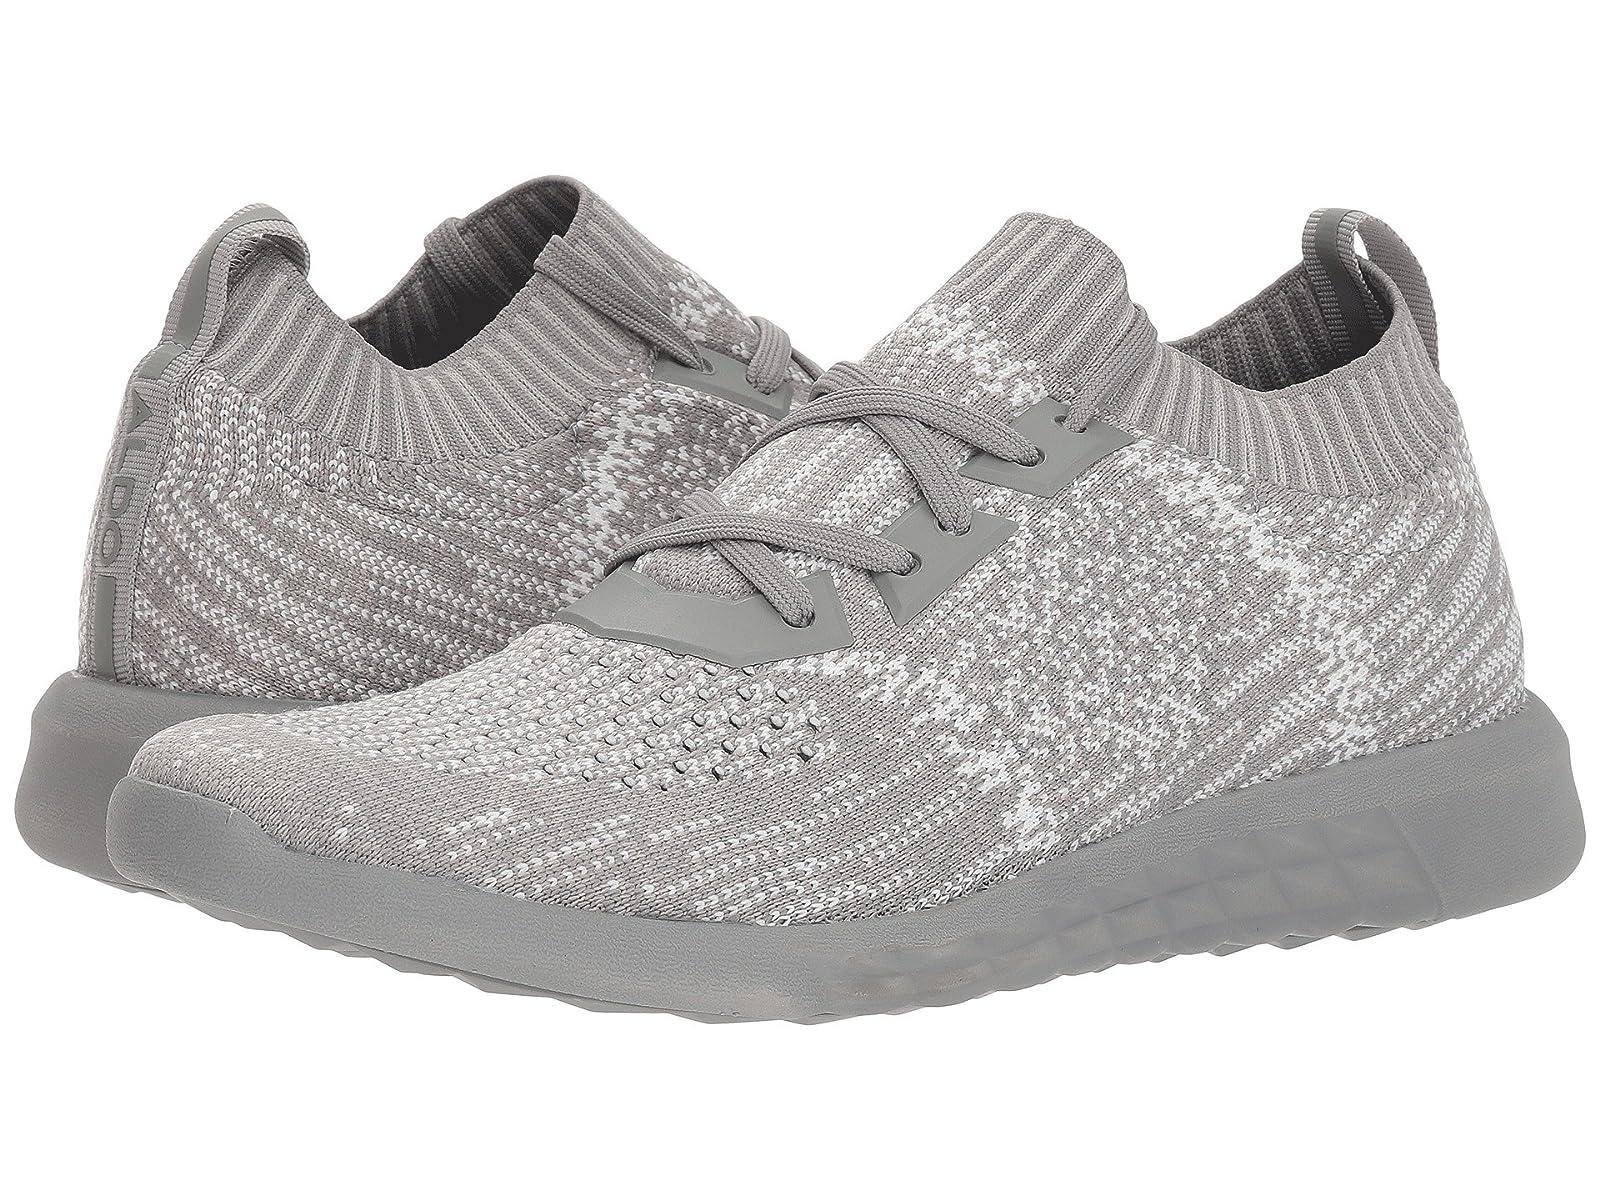 ALDO MX.2AAtmospheric grades have affordable shoes